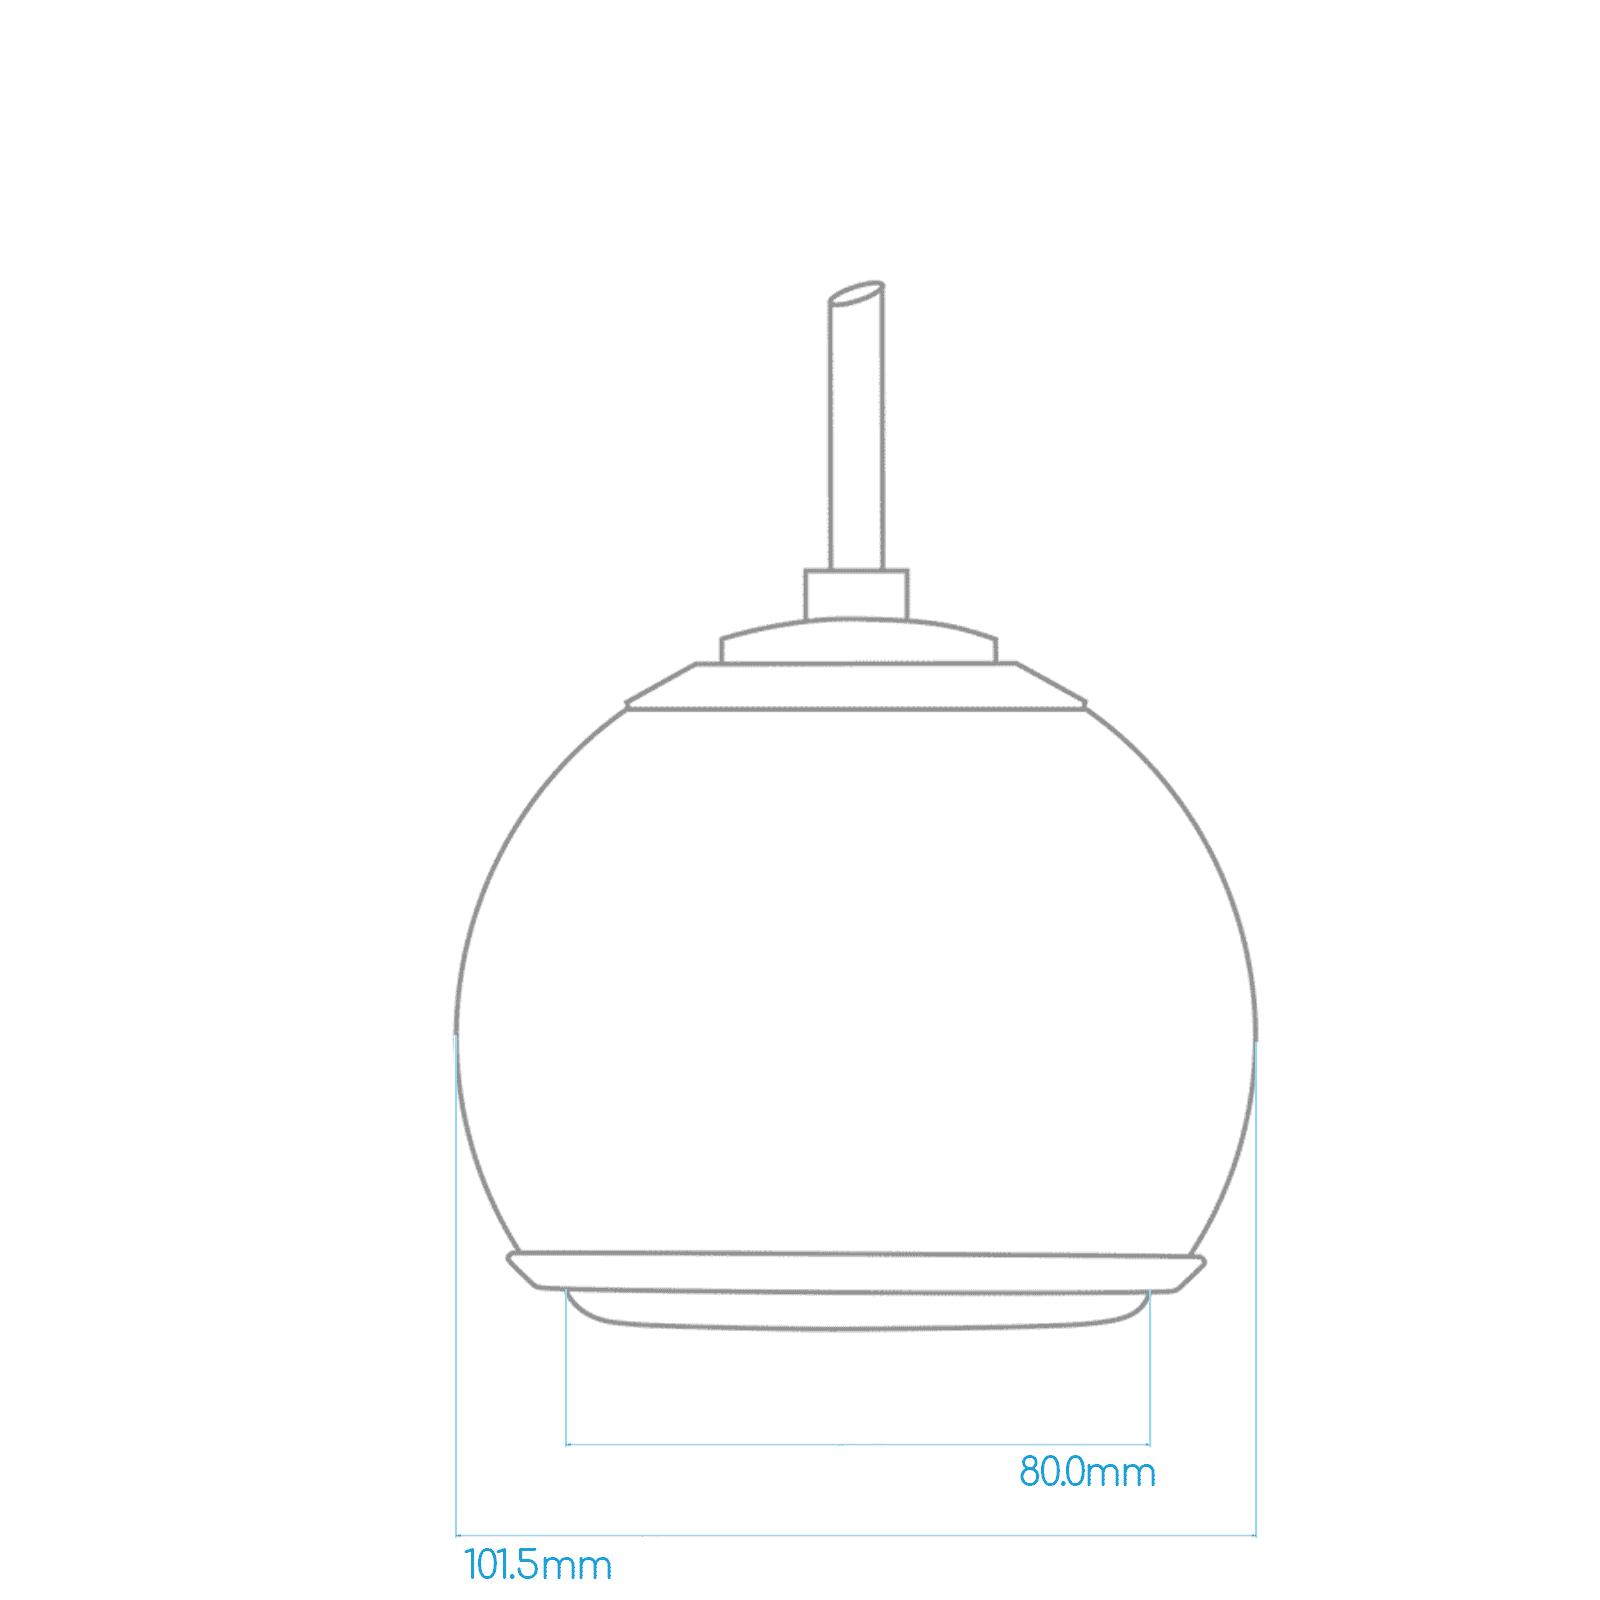 Gallo Acoustics Gallo SE Micro Droplet - Hangende Speaker - Hoogglans Zwart